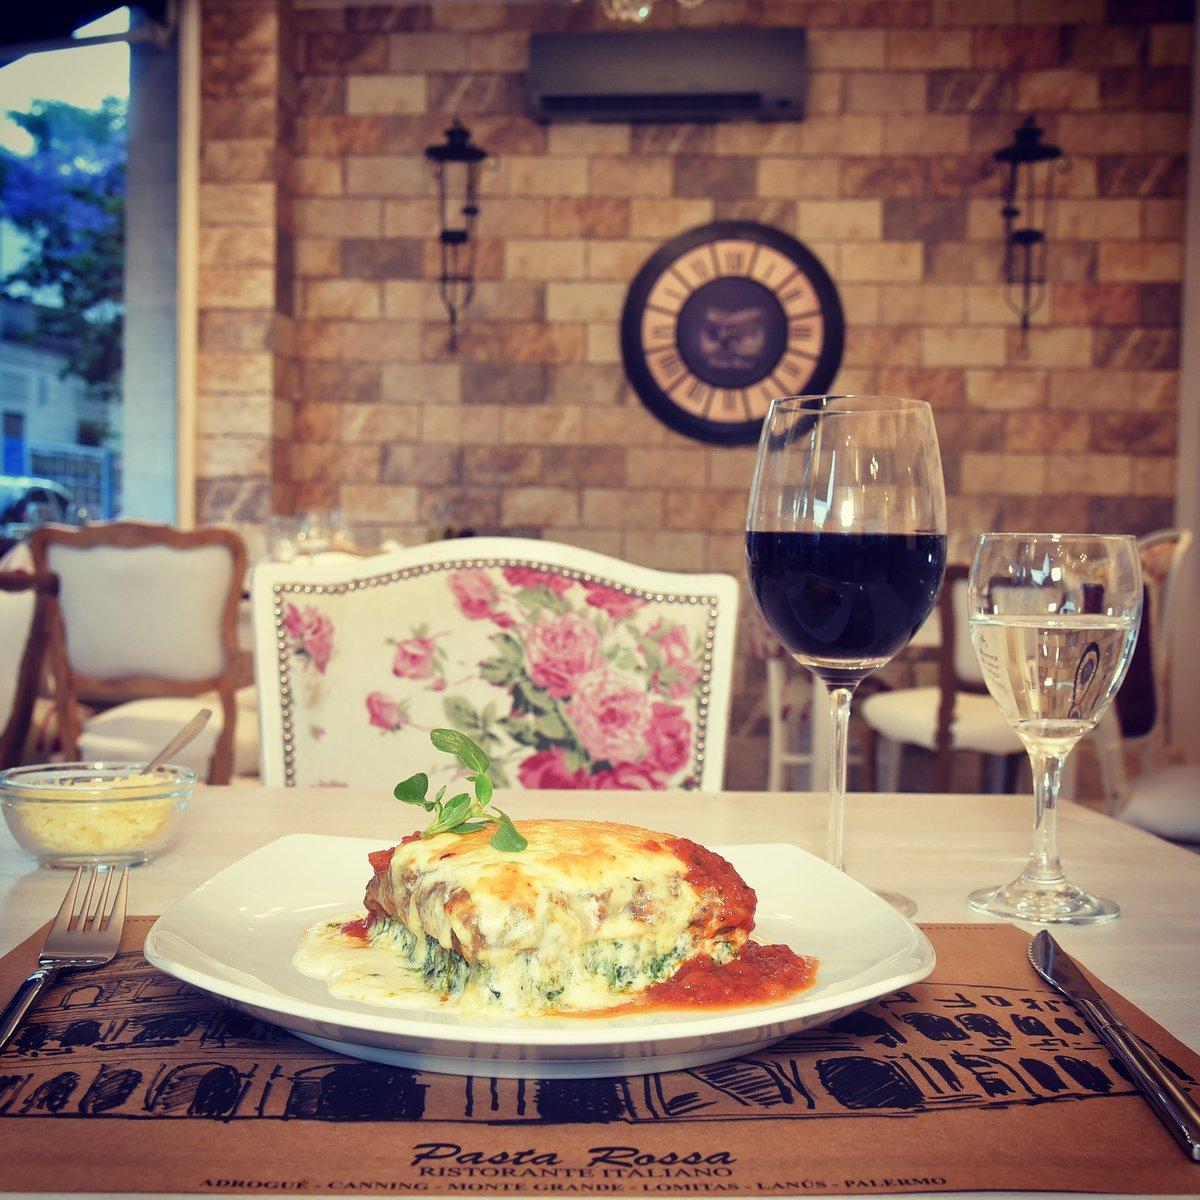 Pasta Rossa's photo on #finde